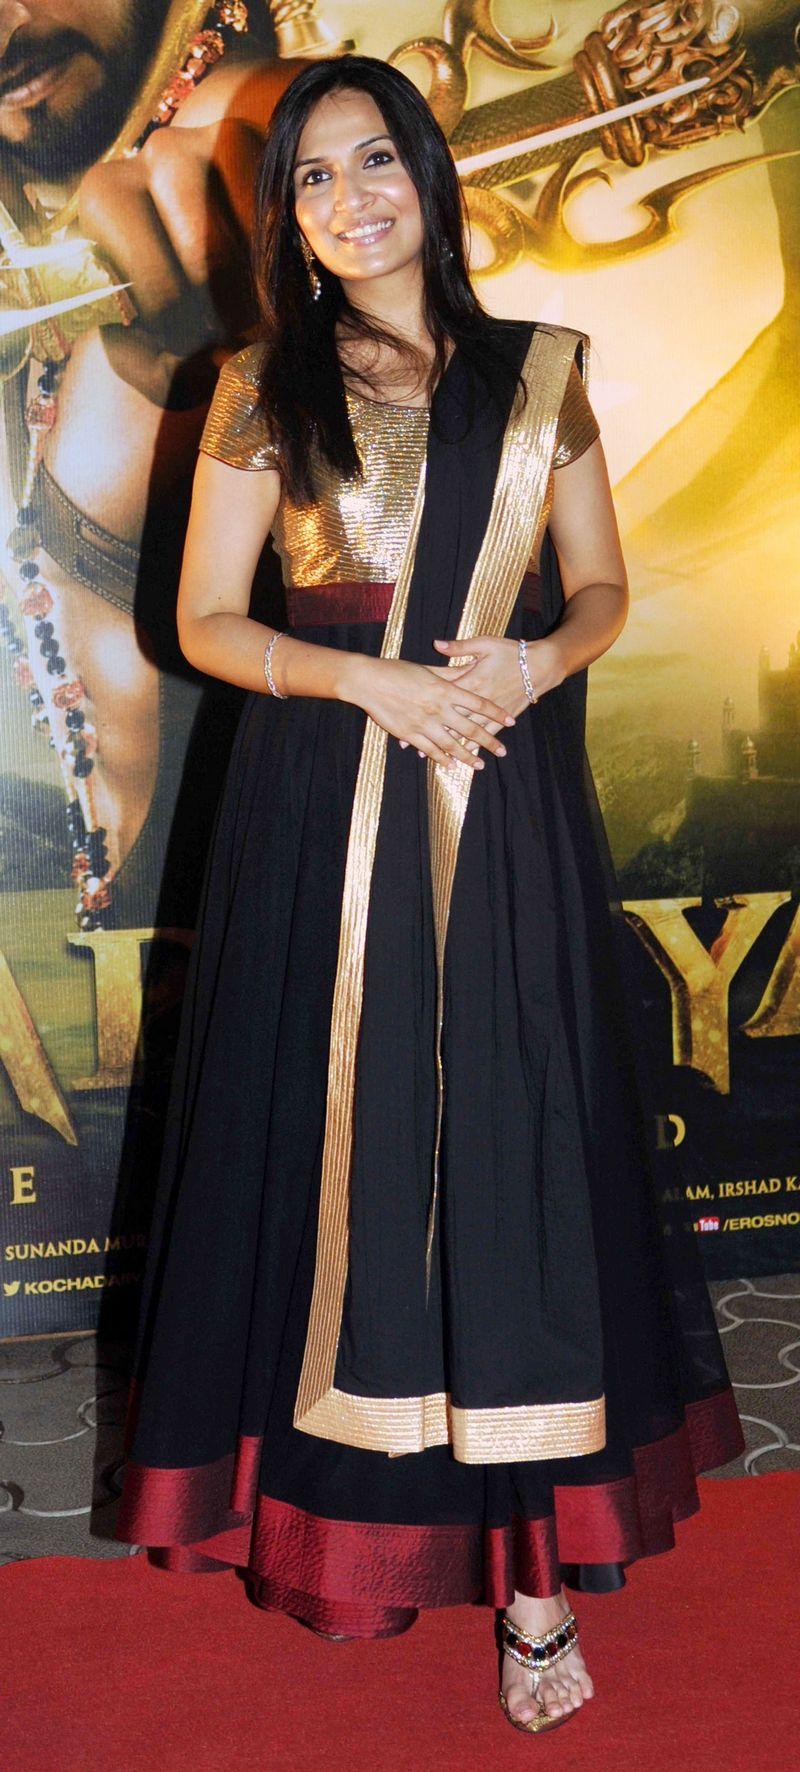 Soundarya looked lovely at the curtain raiser event of 'Kochadaiiyaan'